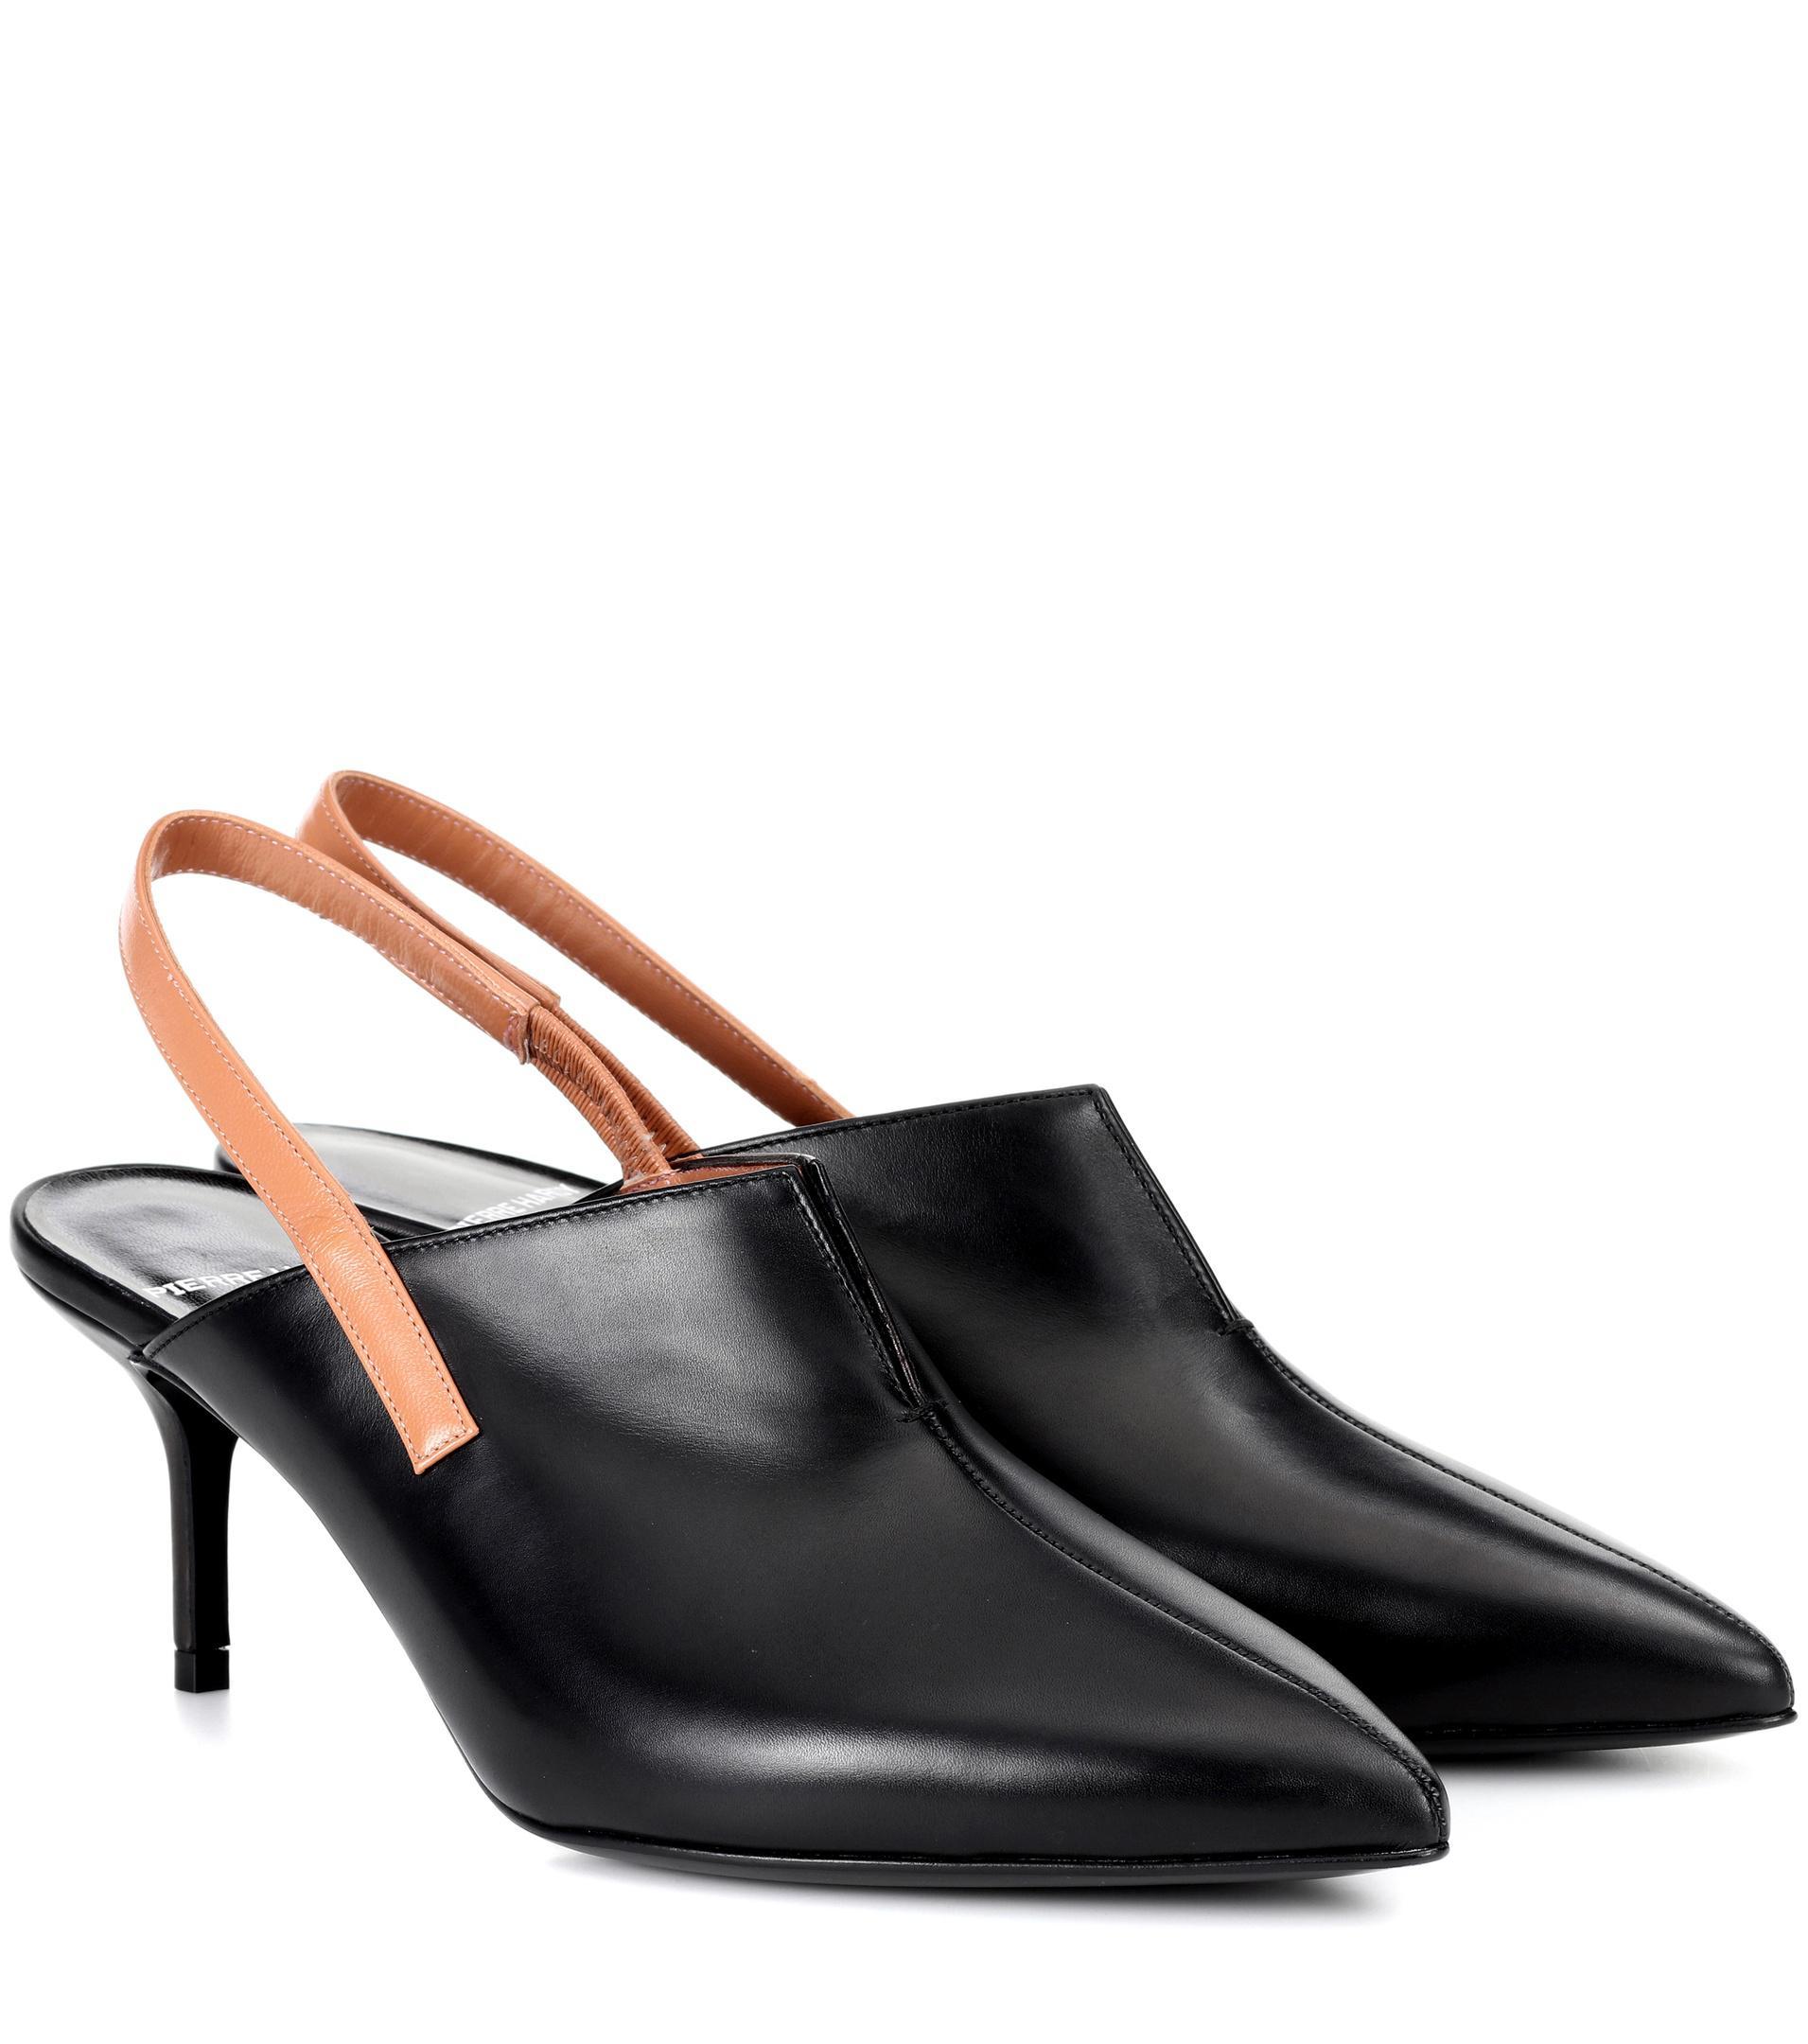 Sale Cheapest Pierre Hardy Secret leather slingback sandals Outlet 2018 New Official Online Cheap Enjoy HjfYUnByM